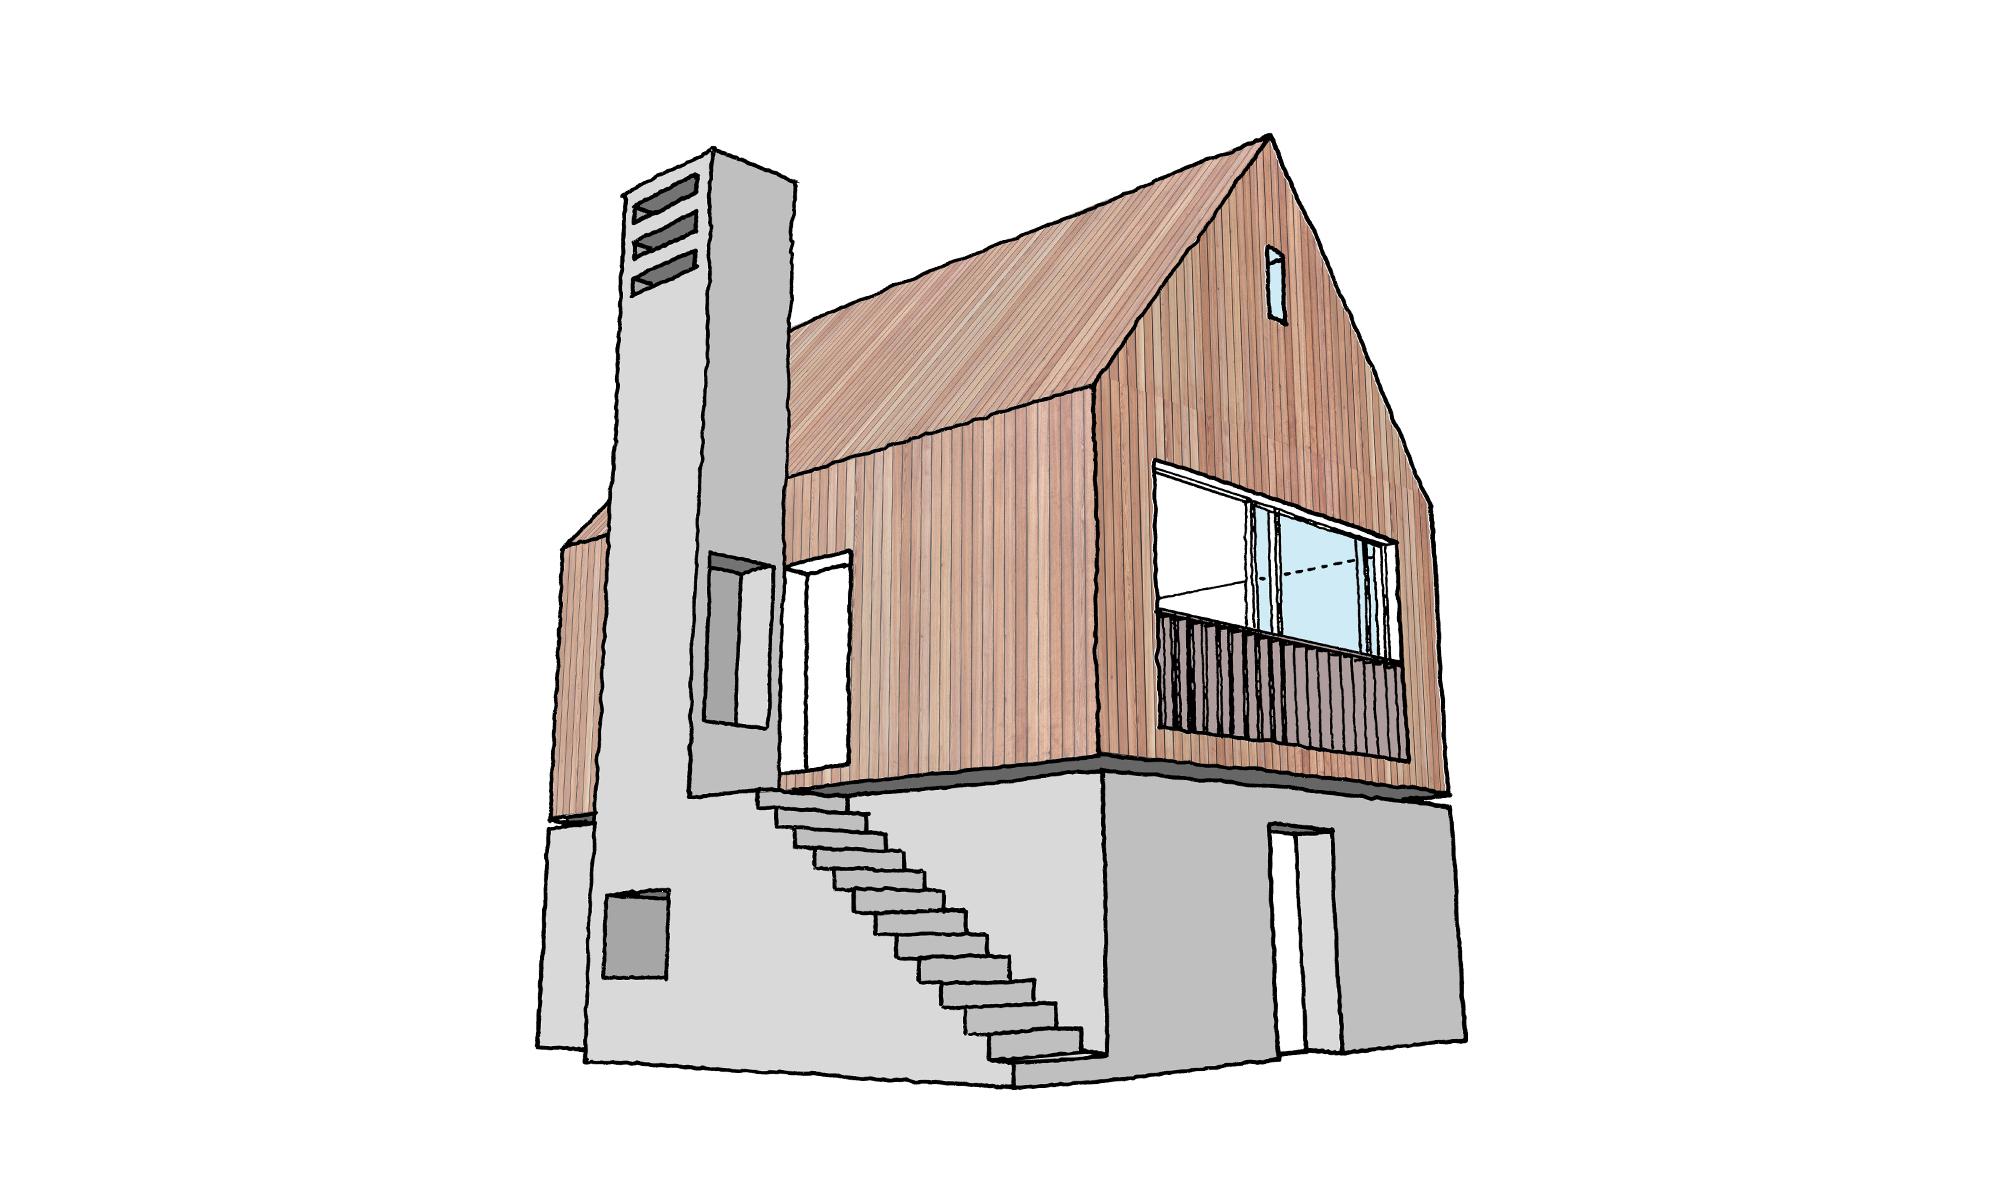 Hesleyside Walled Garden Sketch Bastle Lodge